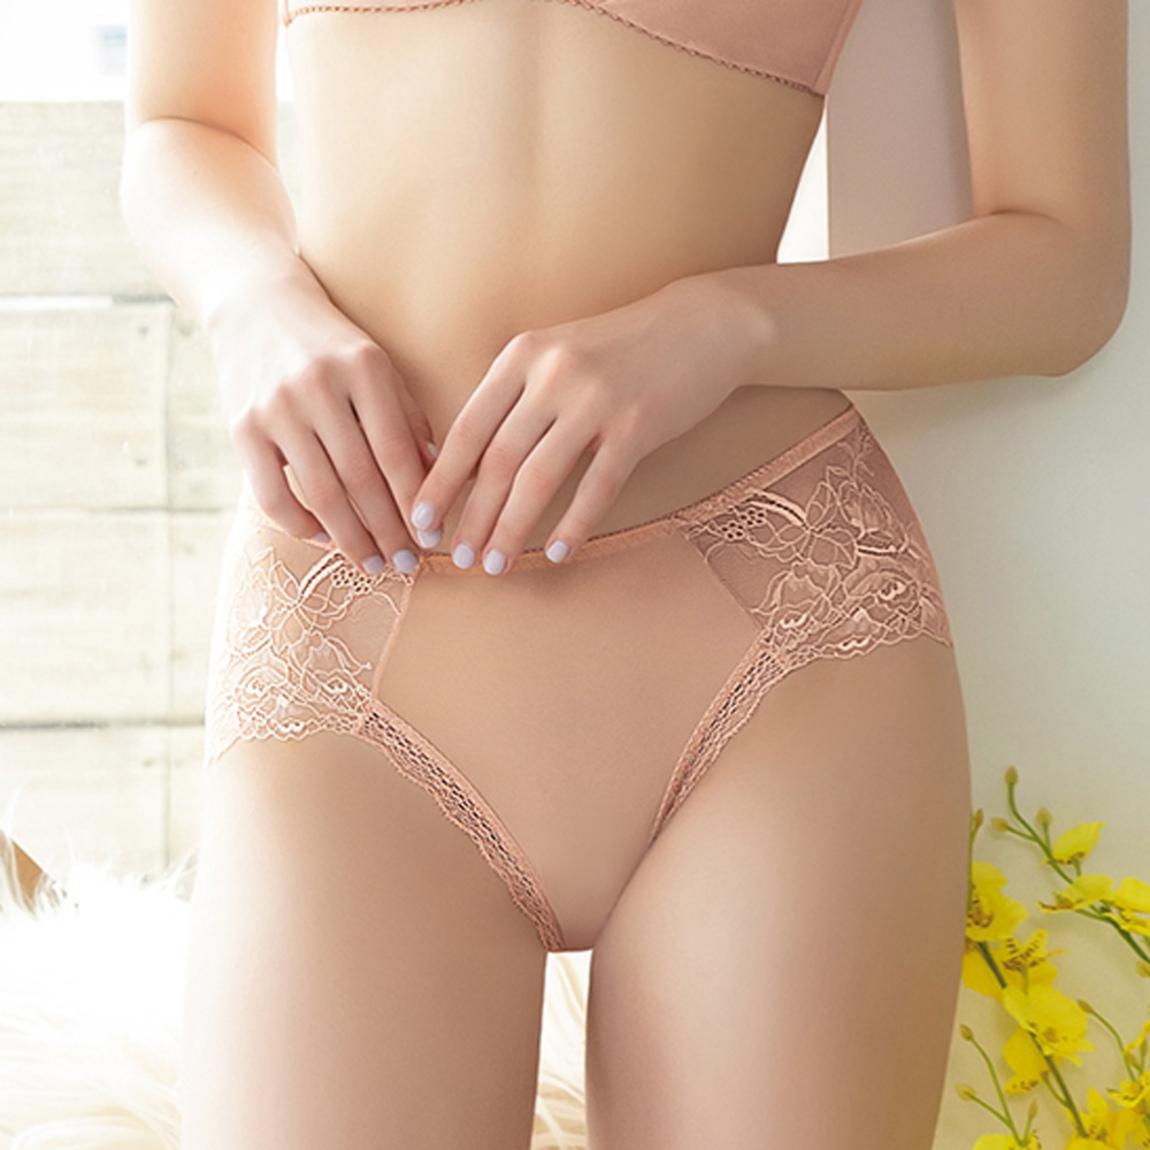 【Lofan 露蒂芬】 美形 法式蕾絲性感內褲 無痕褲 三角褲 中腰-粉(CS1963-PIK)